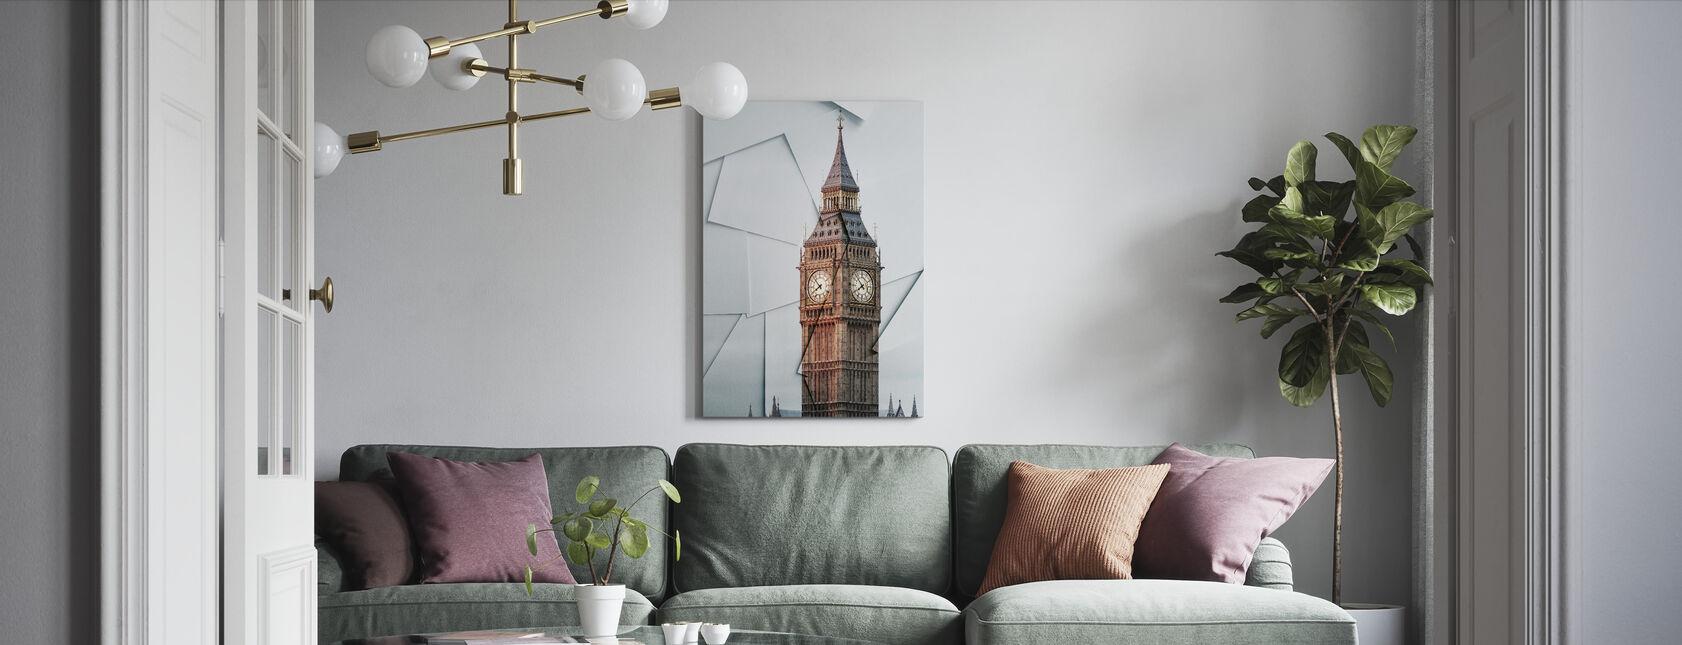 London View - Canvas print - Living Room